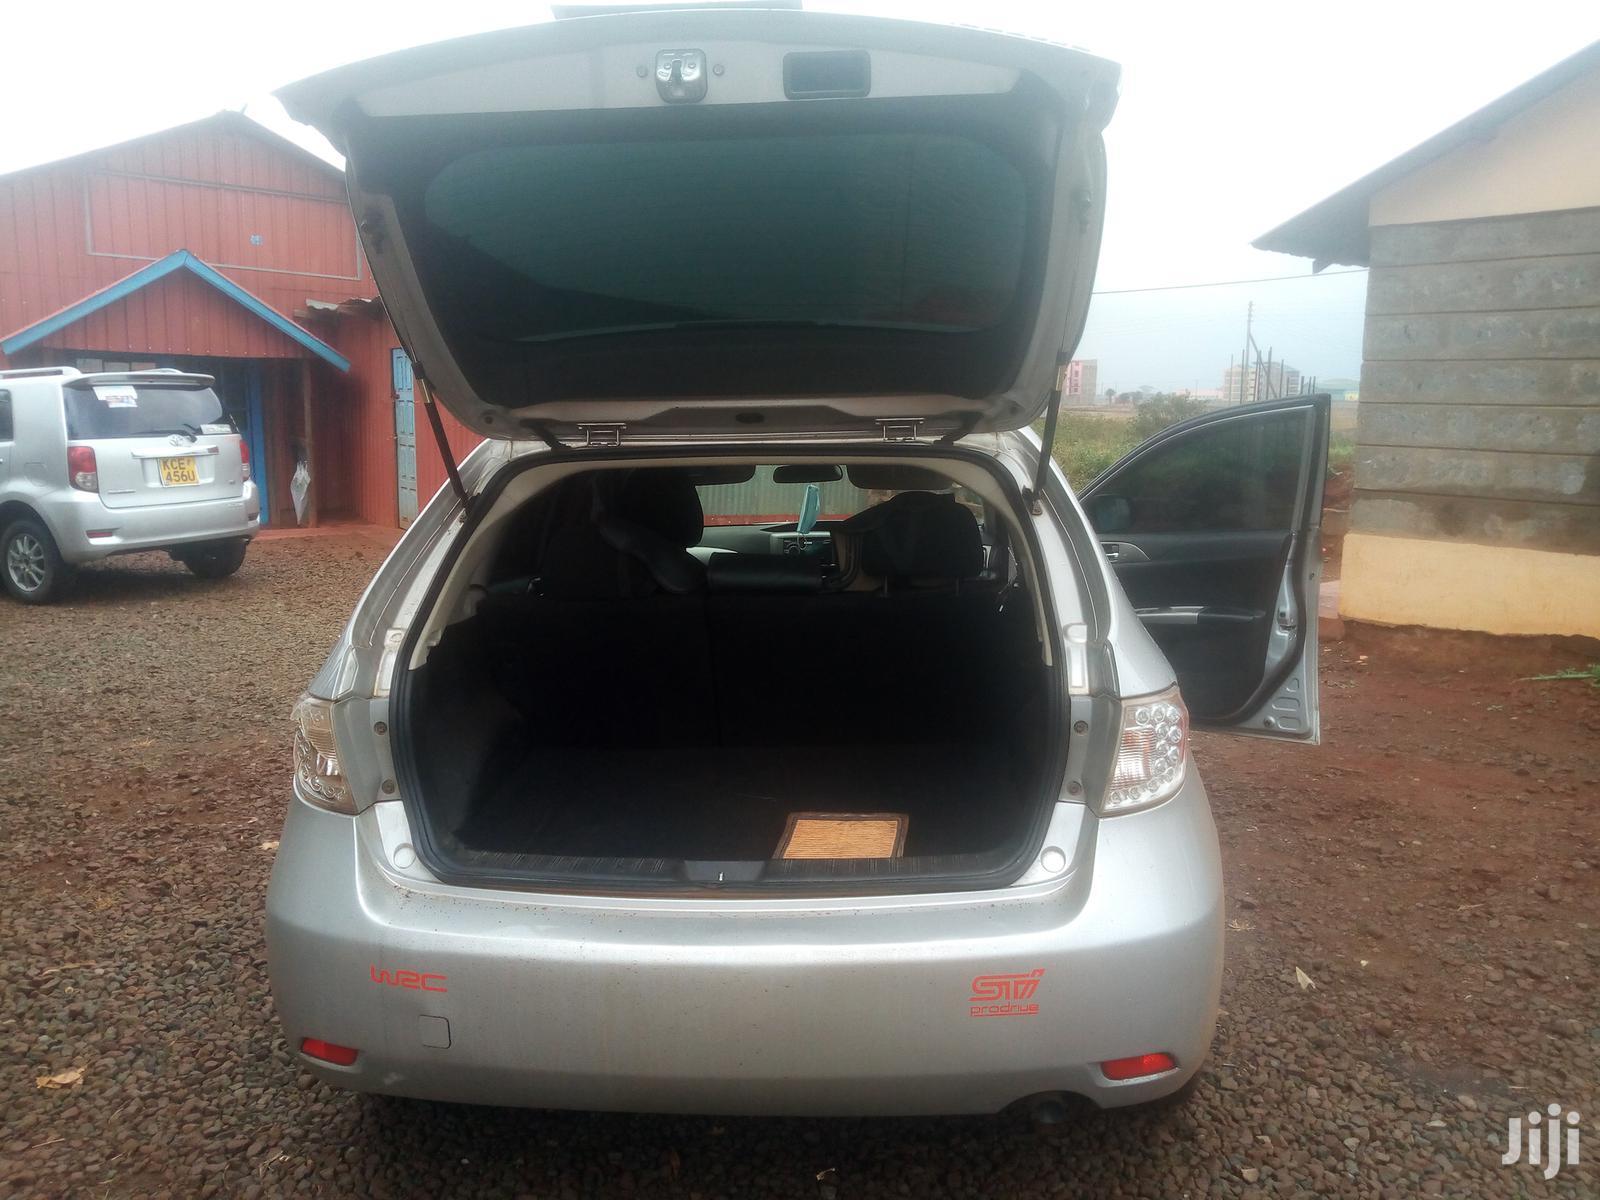 Subaru Impreza 2012 Gray | Cars for sale in Thika, Kiambu, Kenya